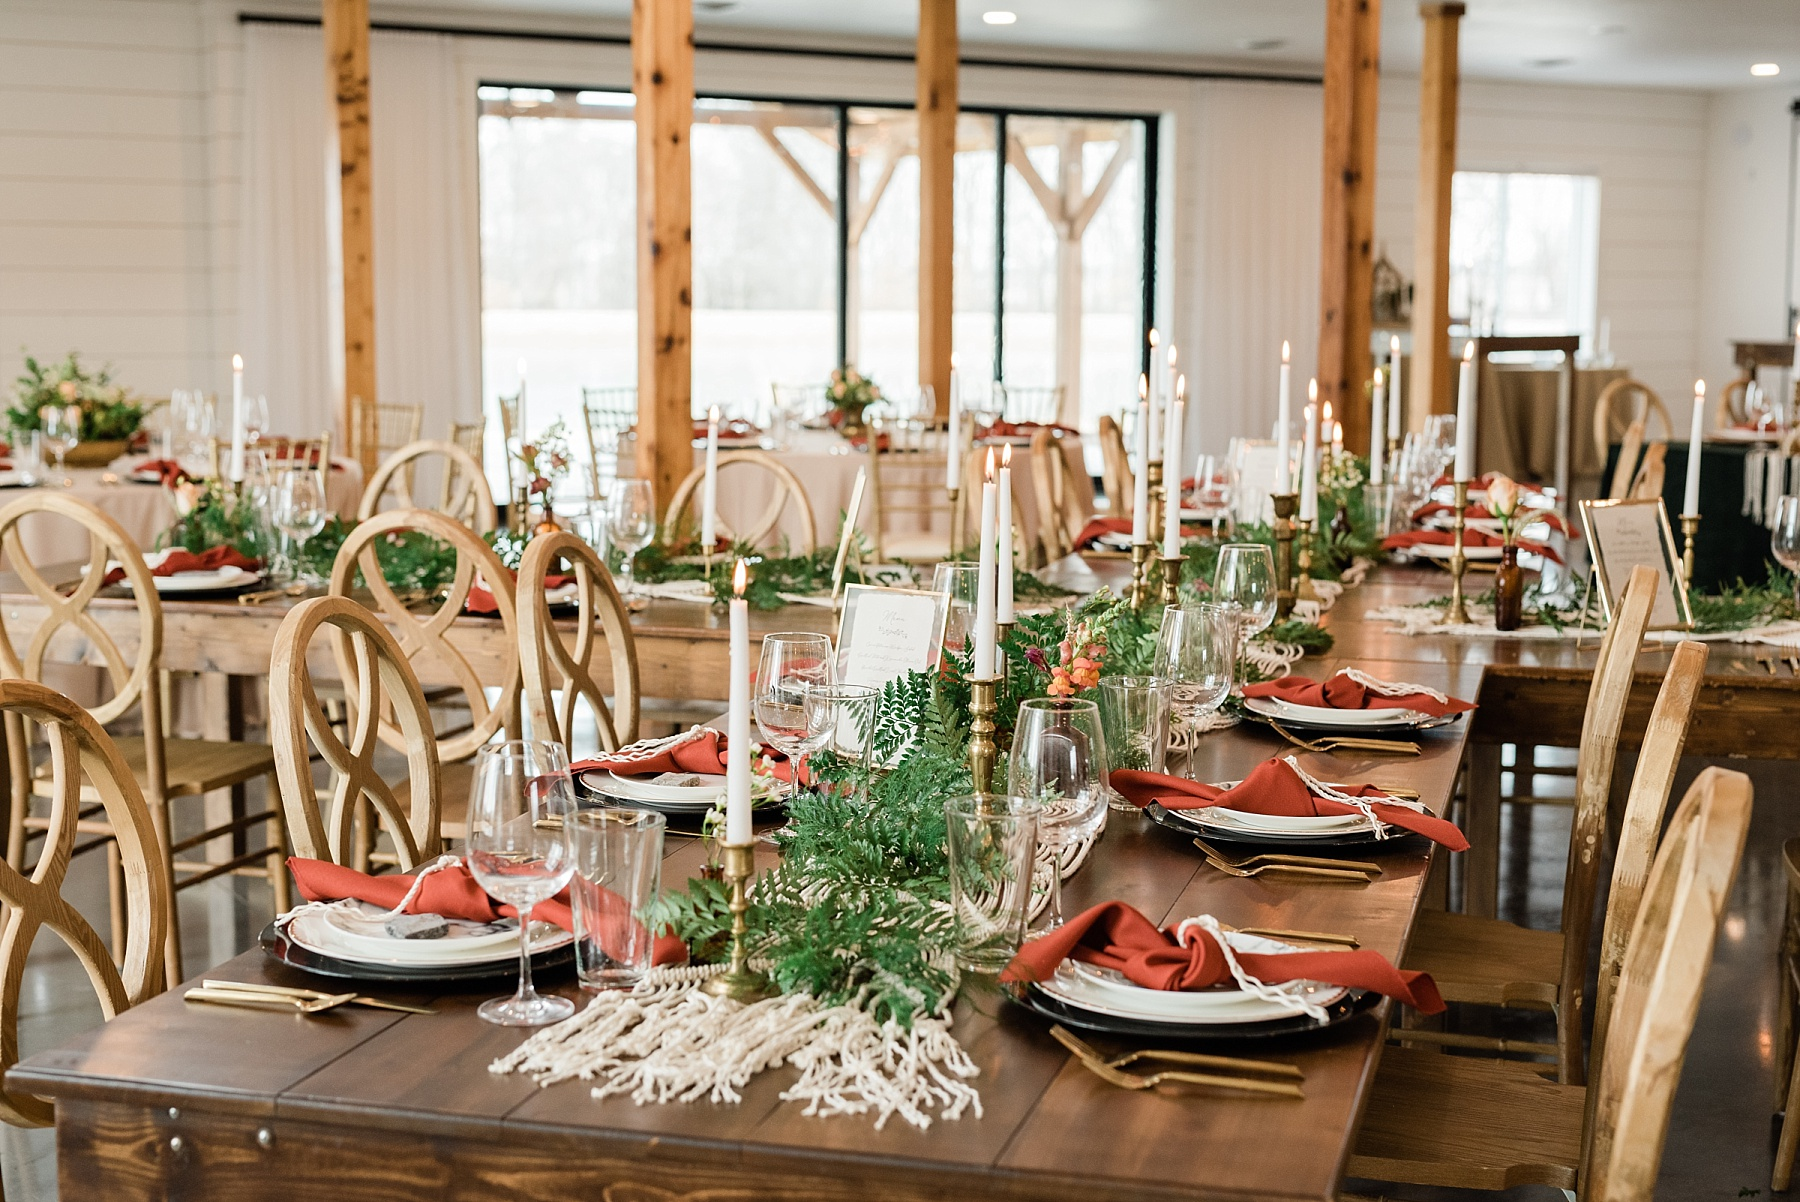 Eclectic Scandinavian Winter Wedding in All White Venue Emerson Fields by Kelsi Kliethermes Photography Best Missouri and Maui Wedding Photographer_0031.jpg